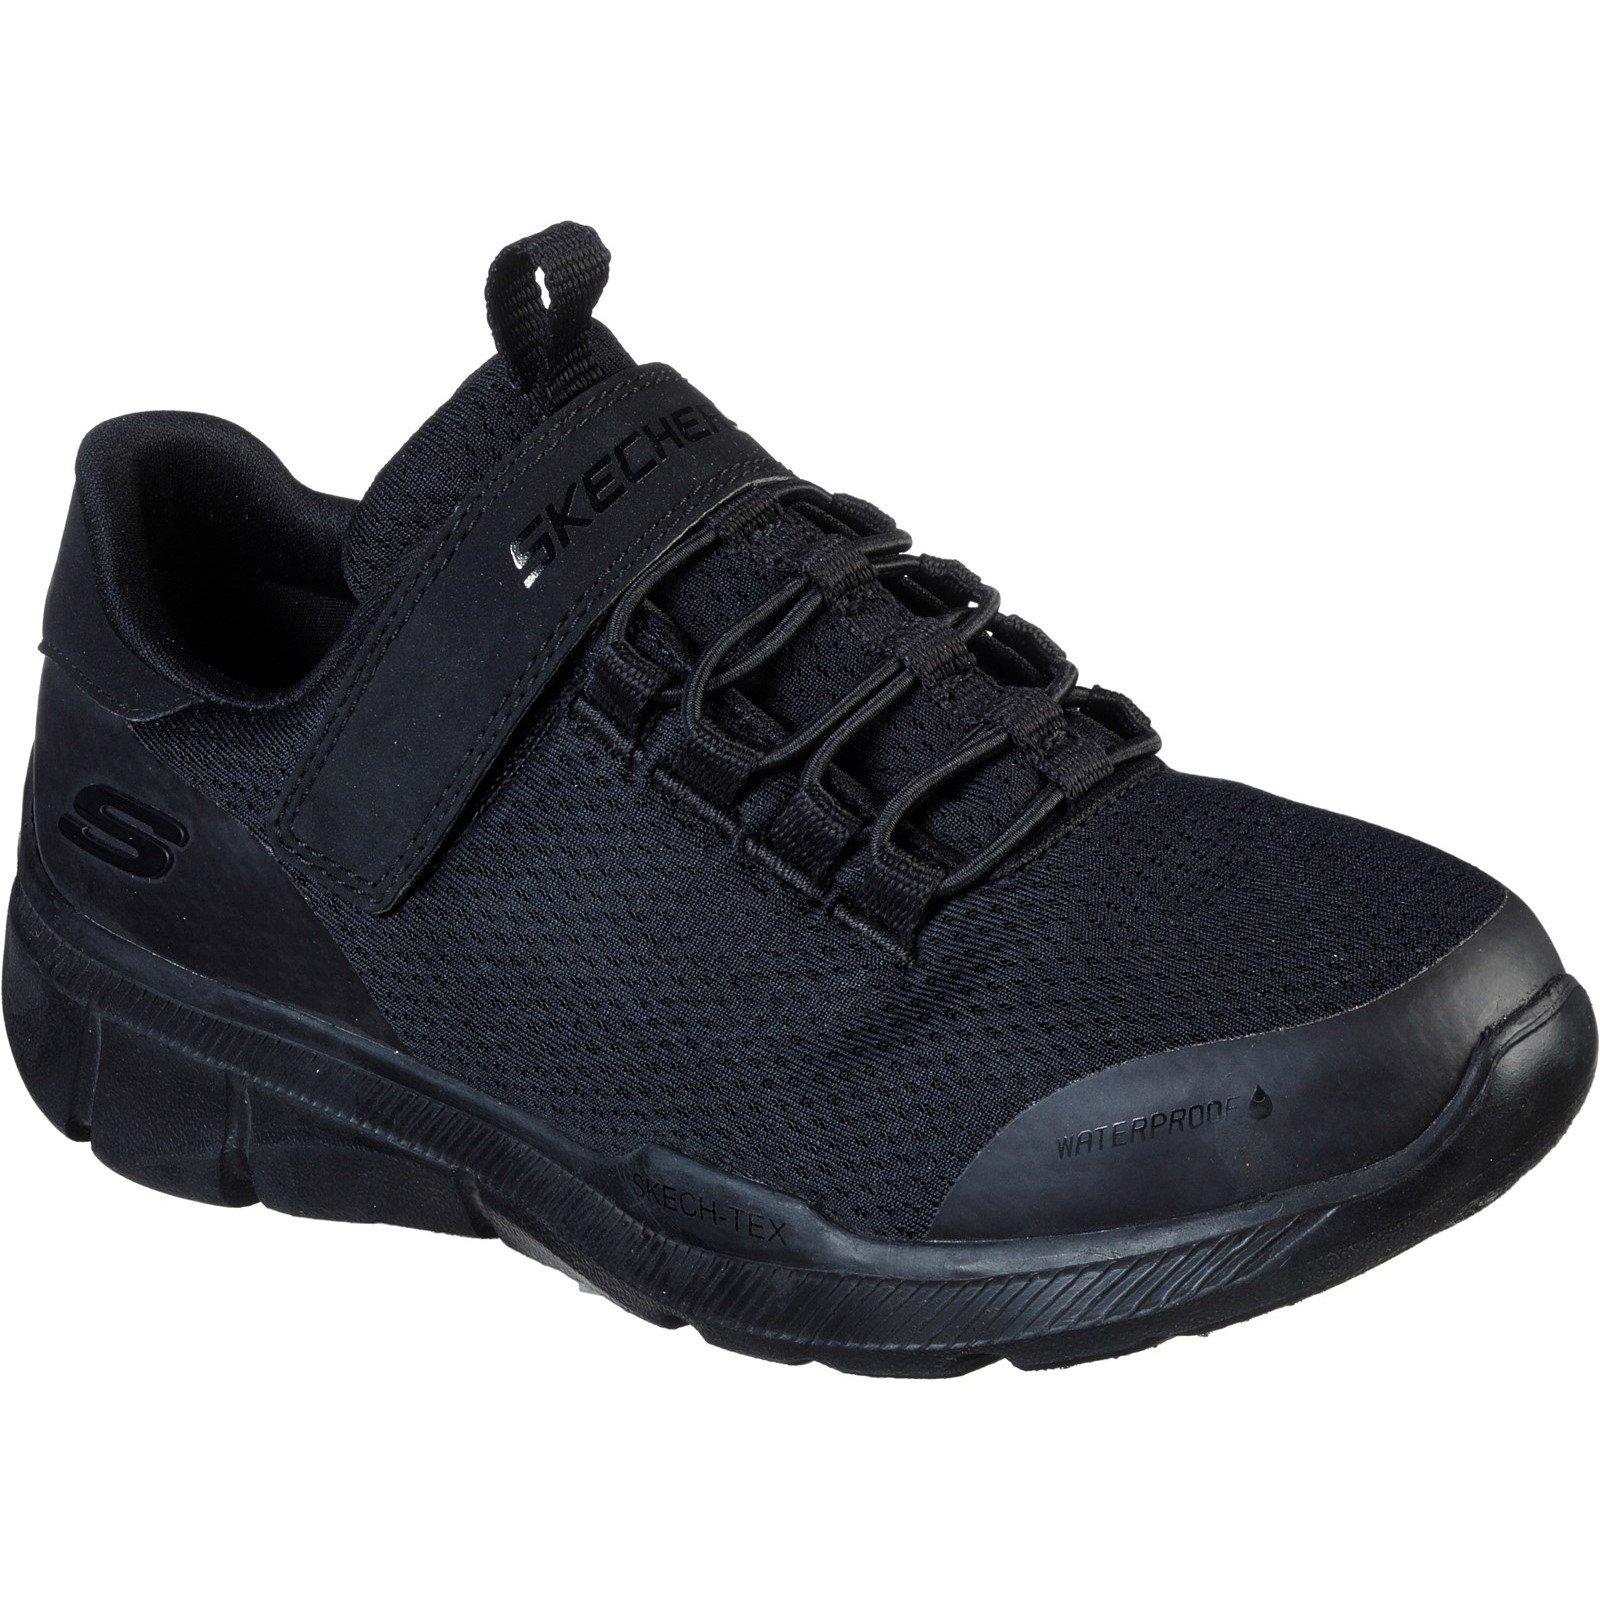 Skechers Unisex Equalizer 3.0 Aquablast Trainer Black 28533 - Black 4